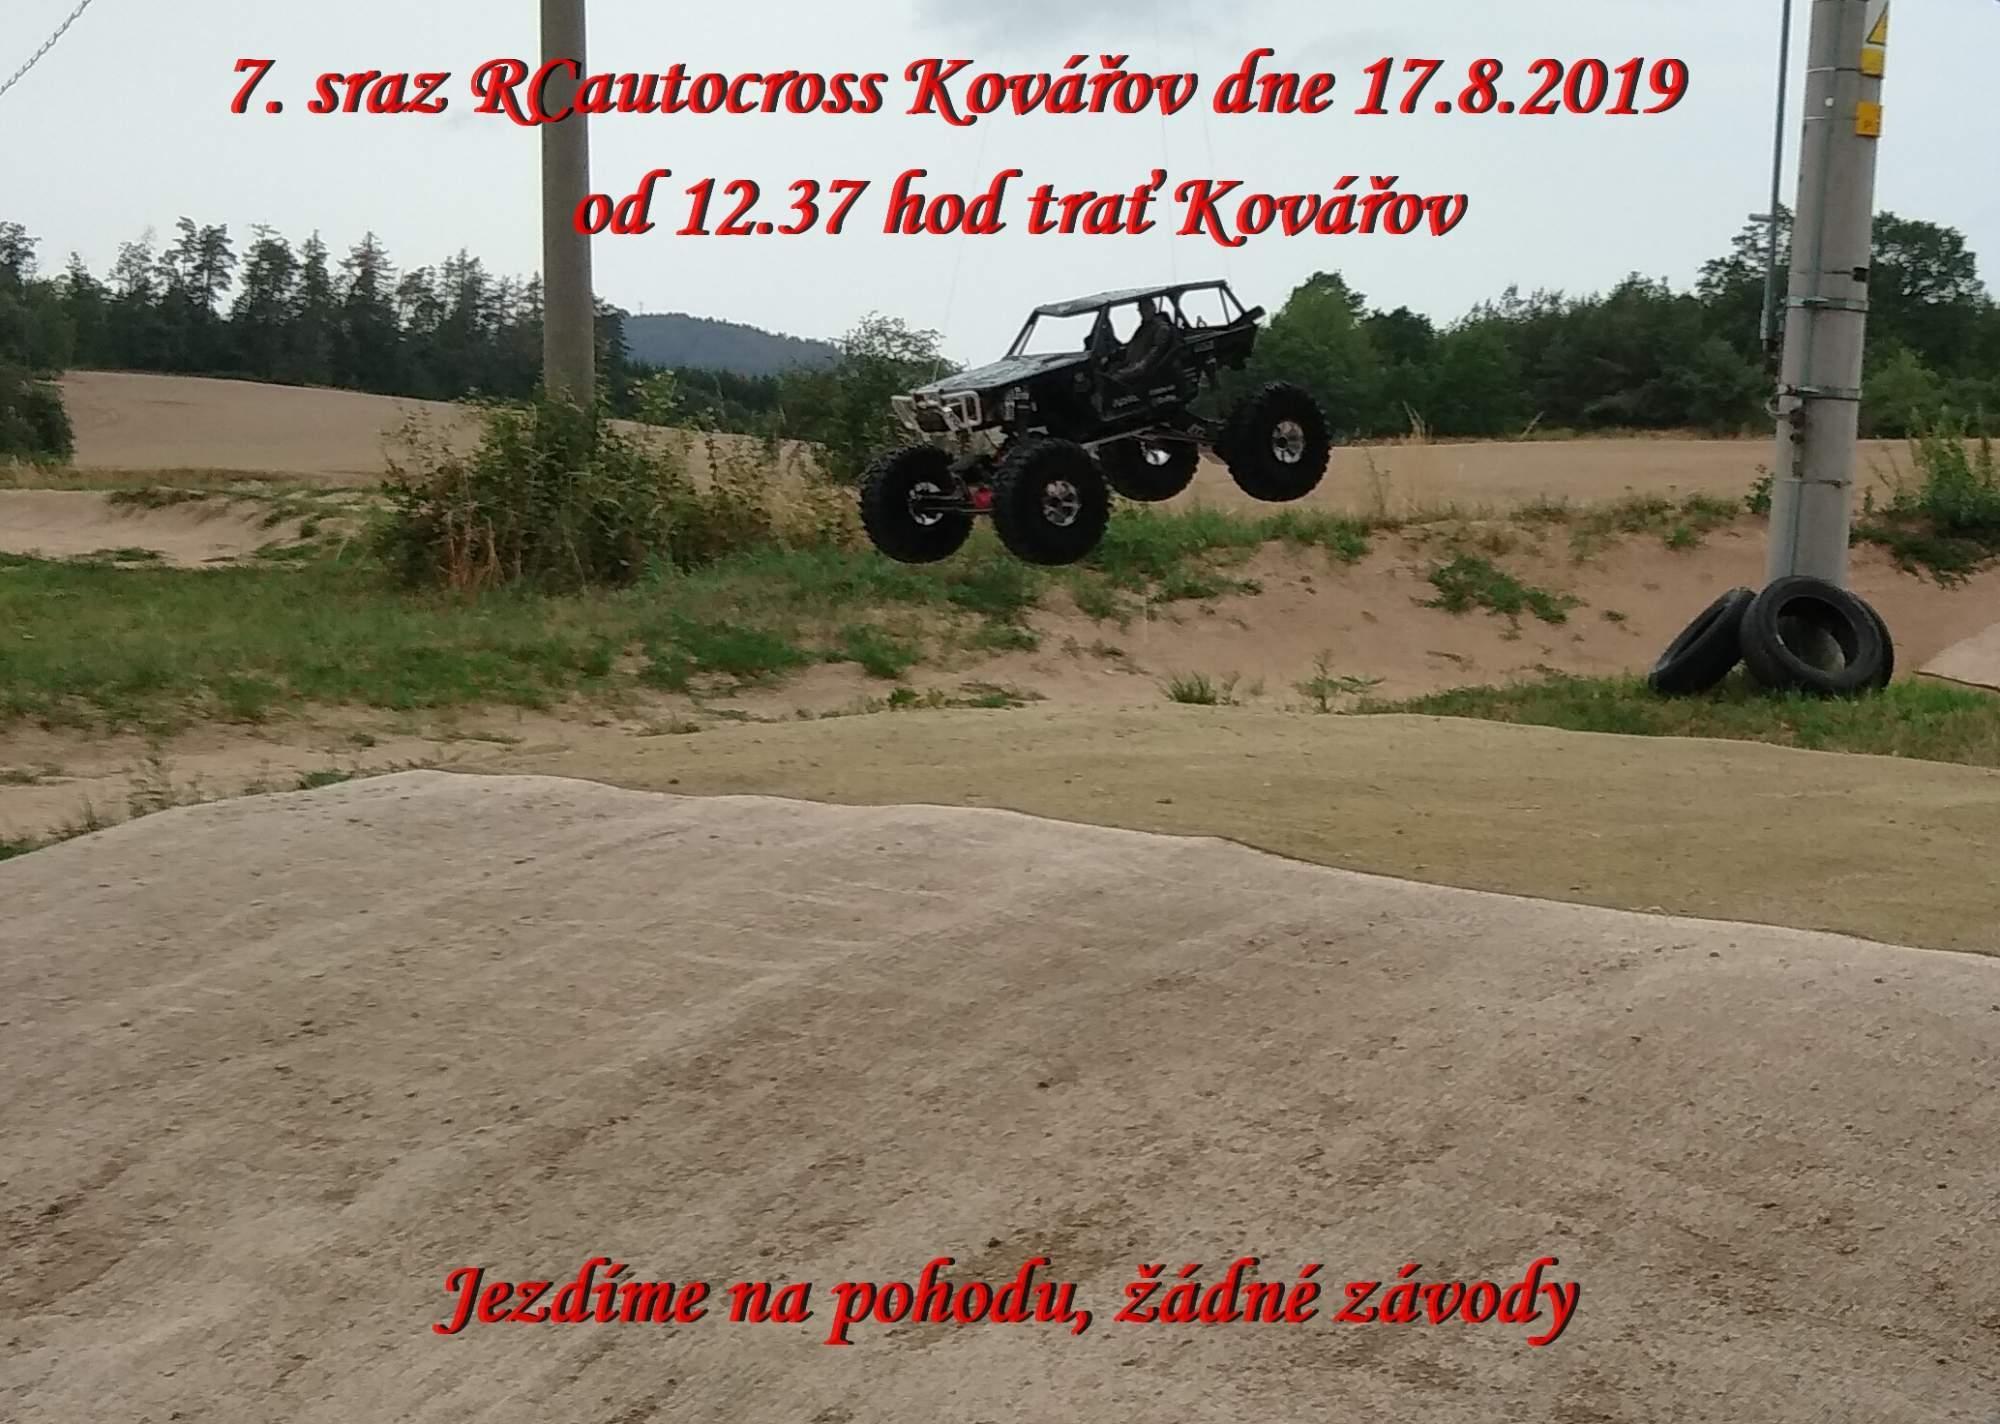 https://img24.rajce.idnes.cz/d2402/13/13870/13870315_ebc8da28dec63b155baae591a881c905/images/7.sraz2019.jpg?ver=0